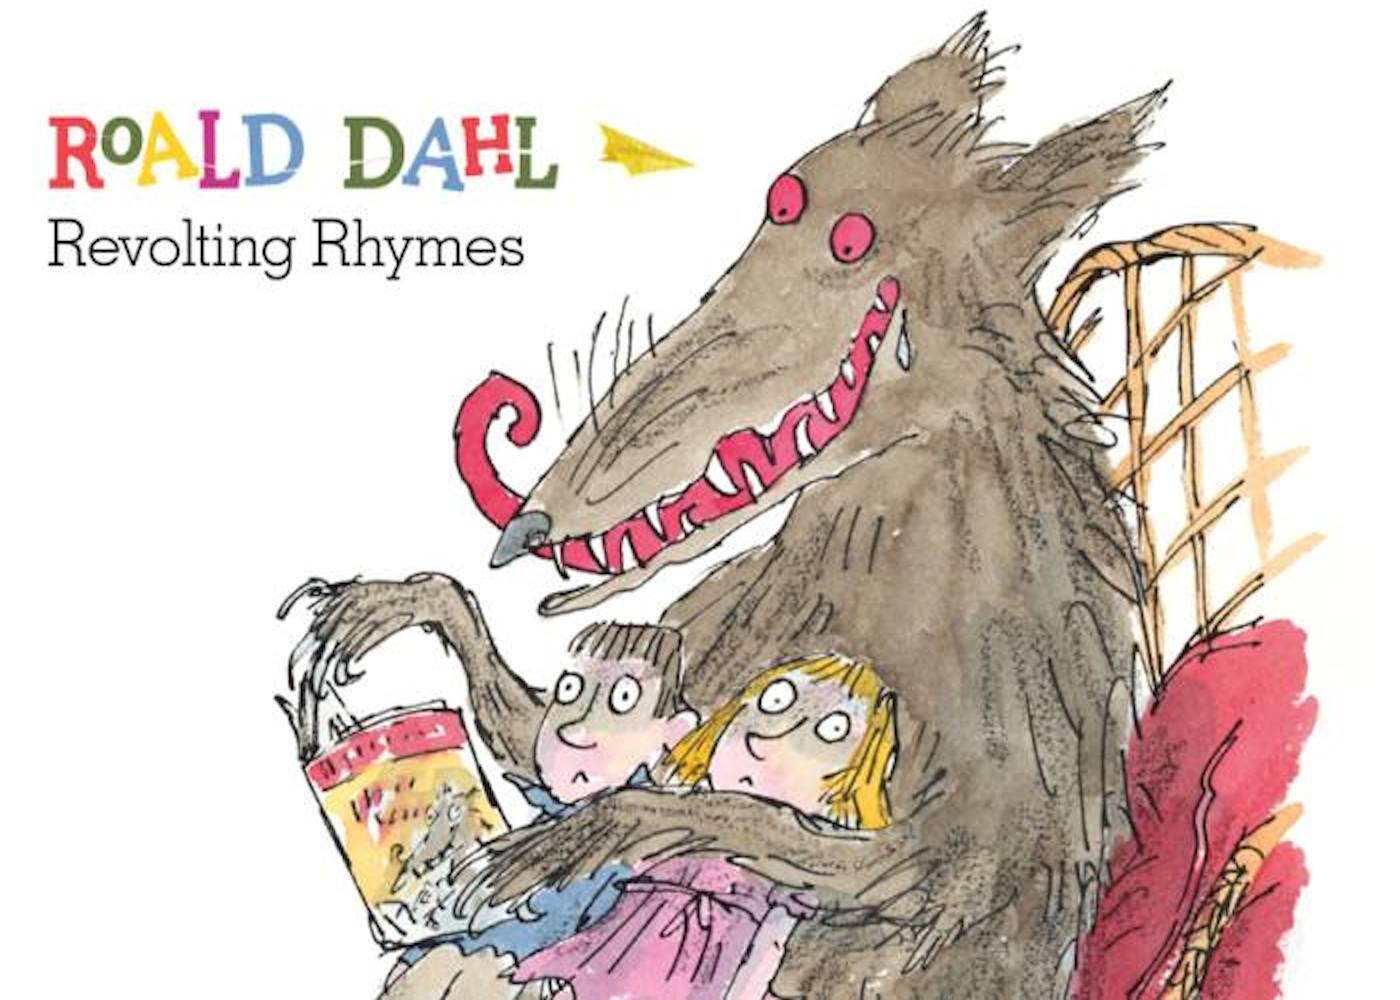 revolting-rhymes roald dahl day children's books